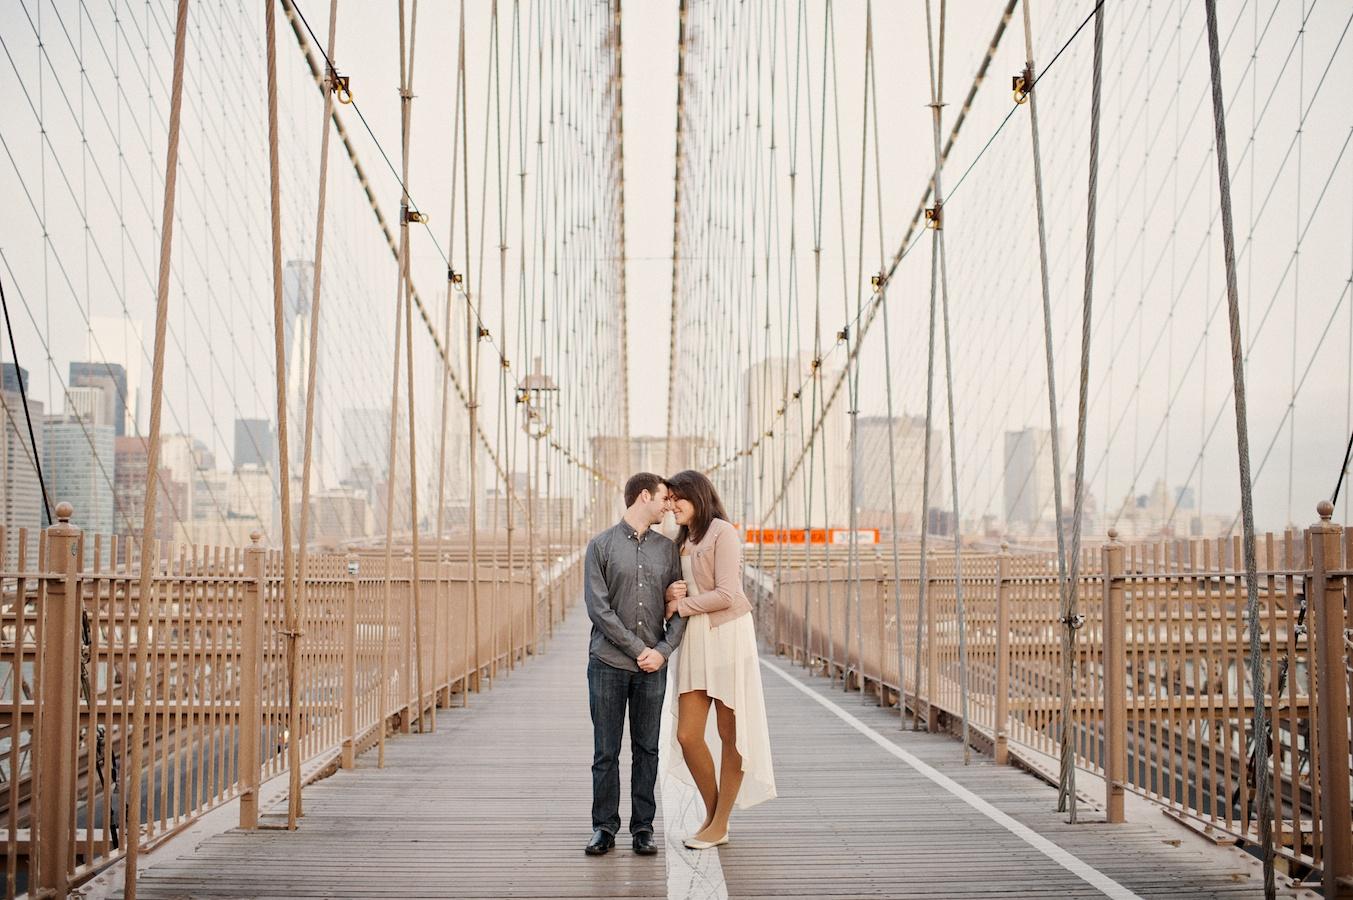 BrooklynBridgeEngagementPhotographer 01